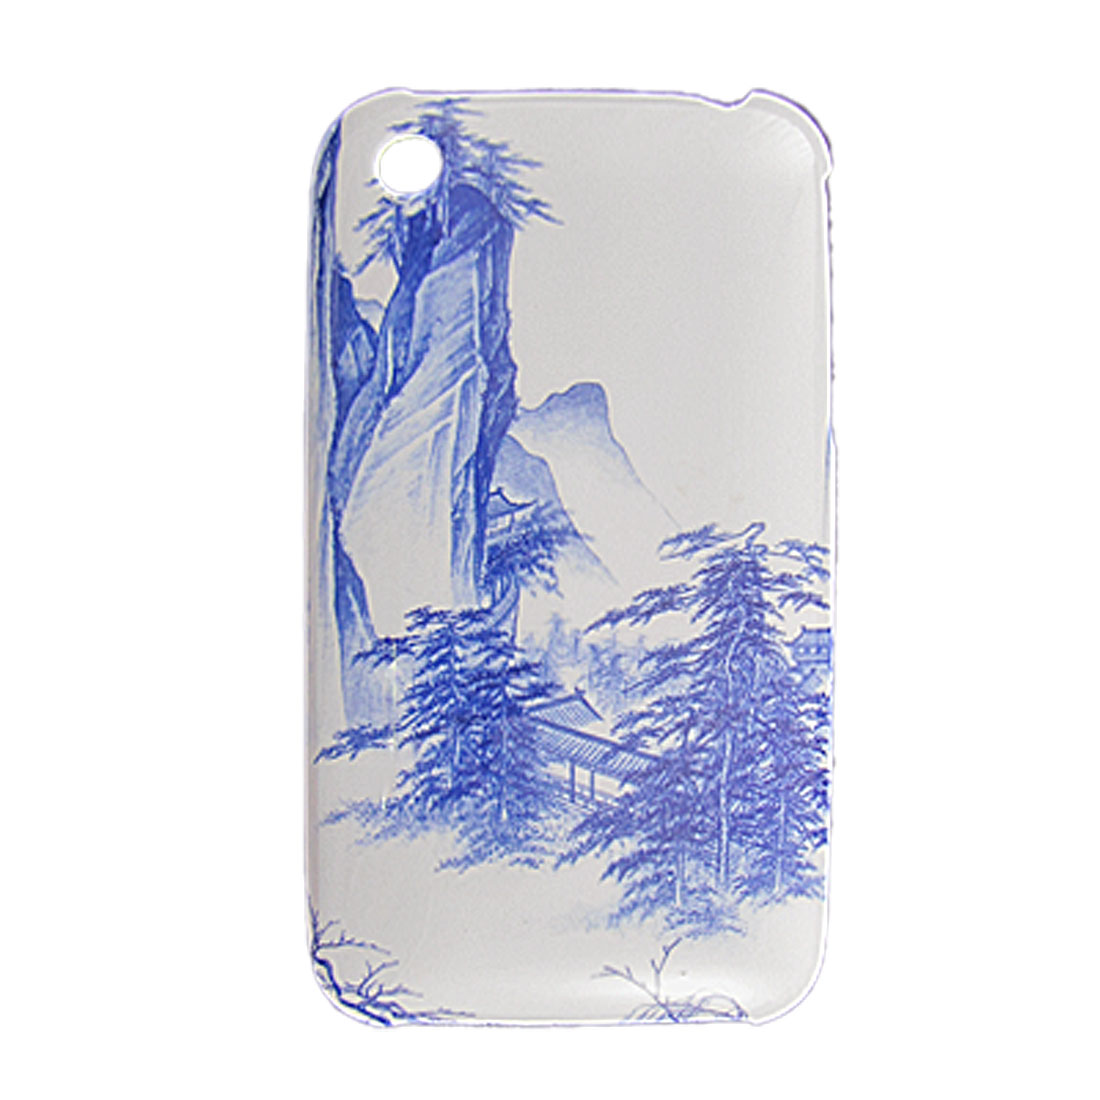 Hard Plastic Landscape Noun Back Case for iPhone 3G